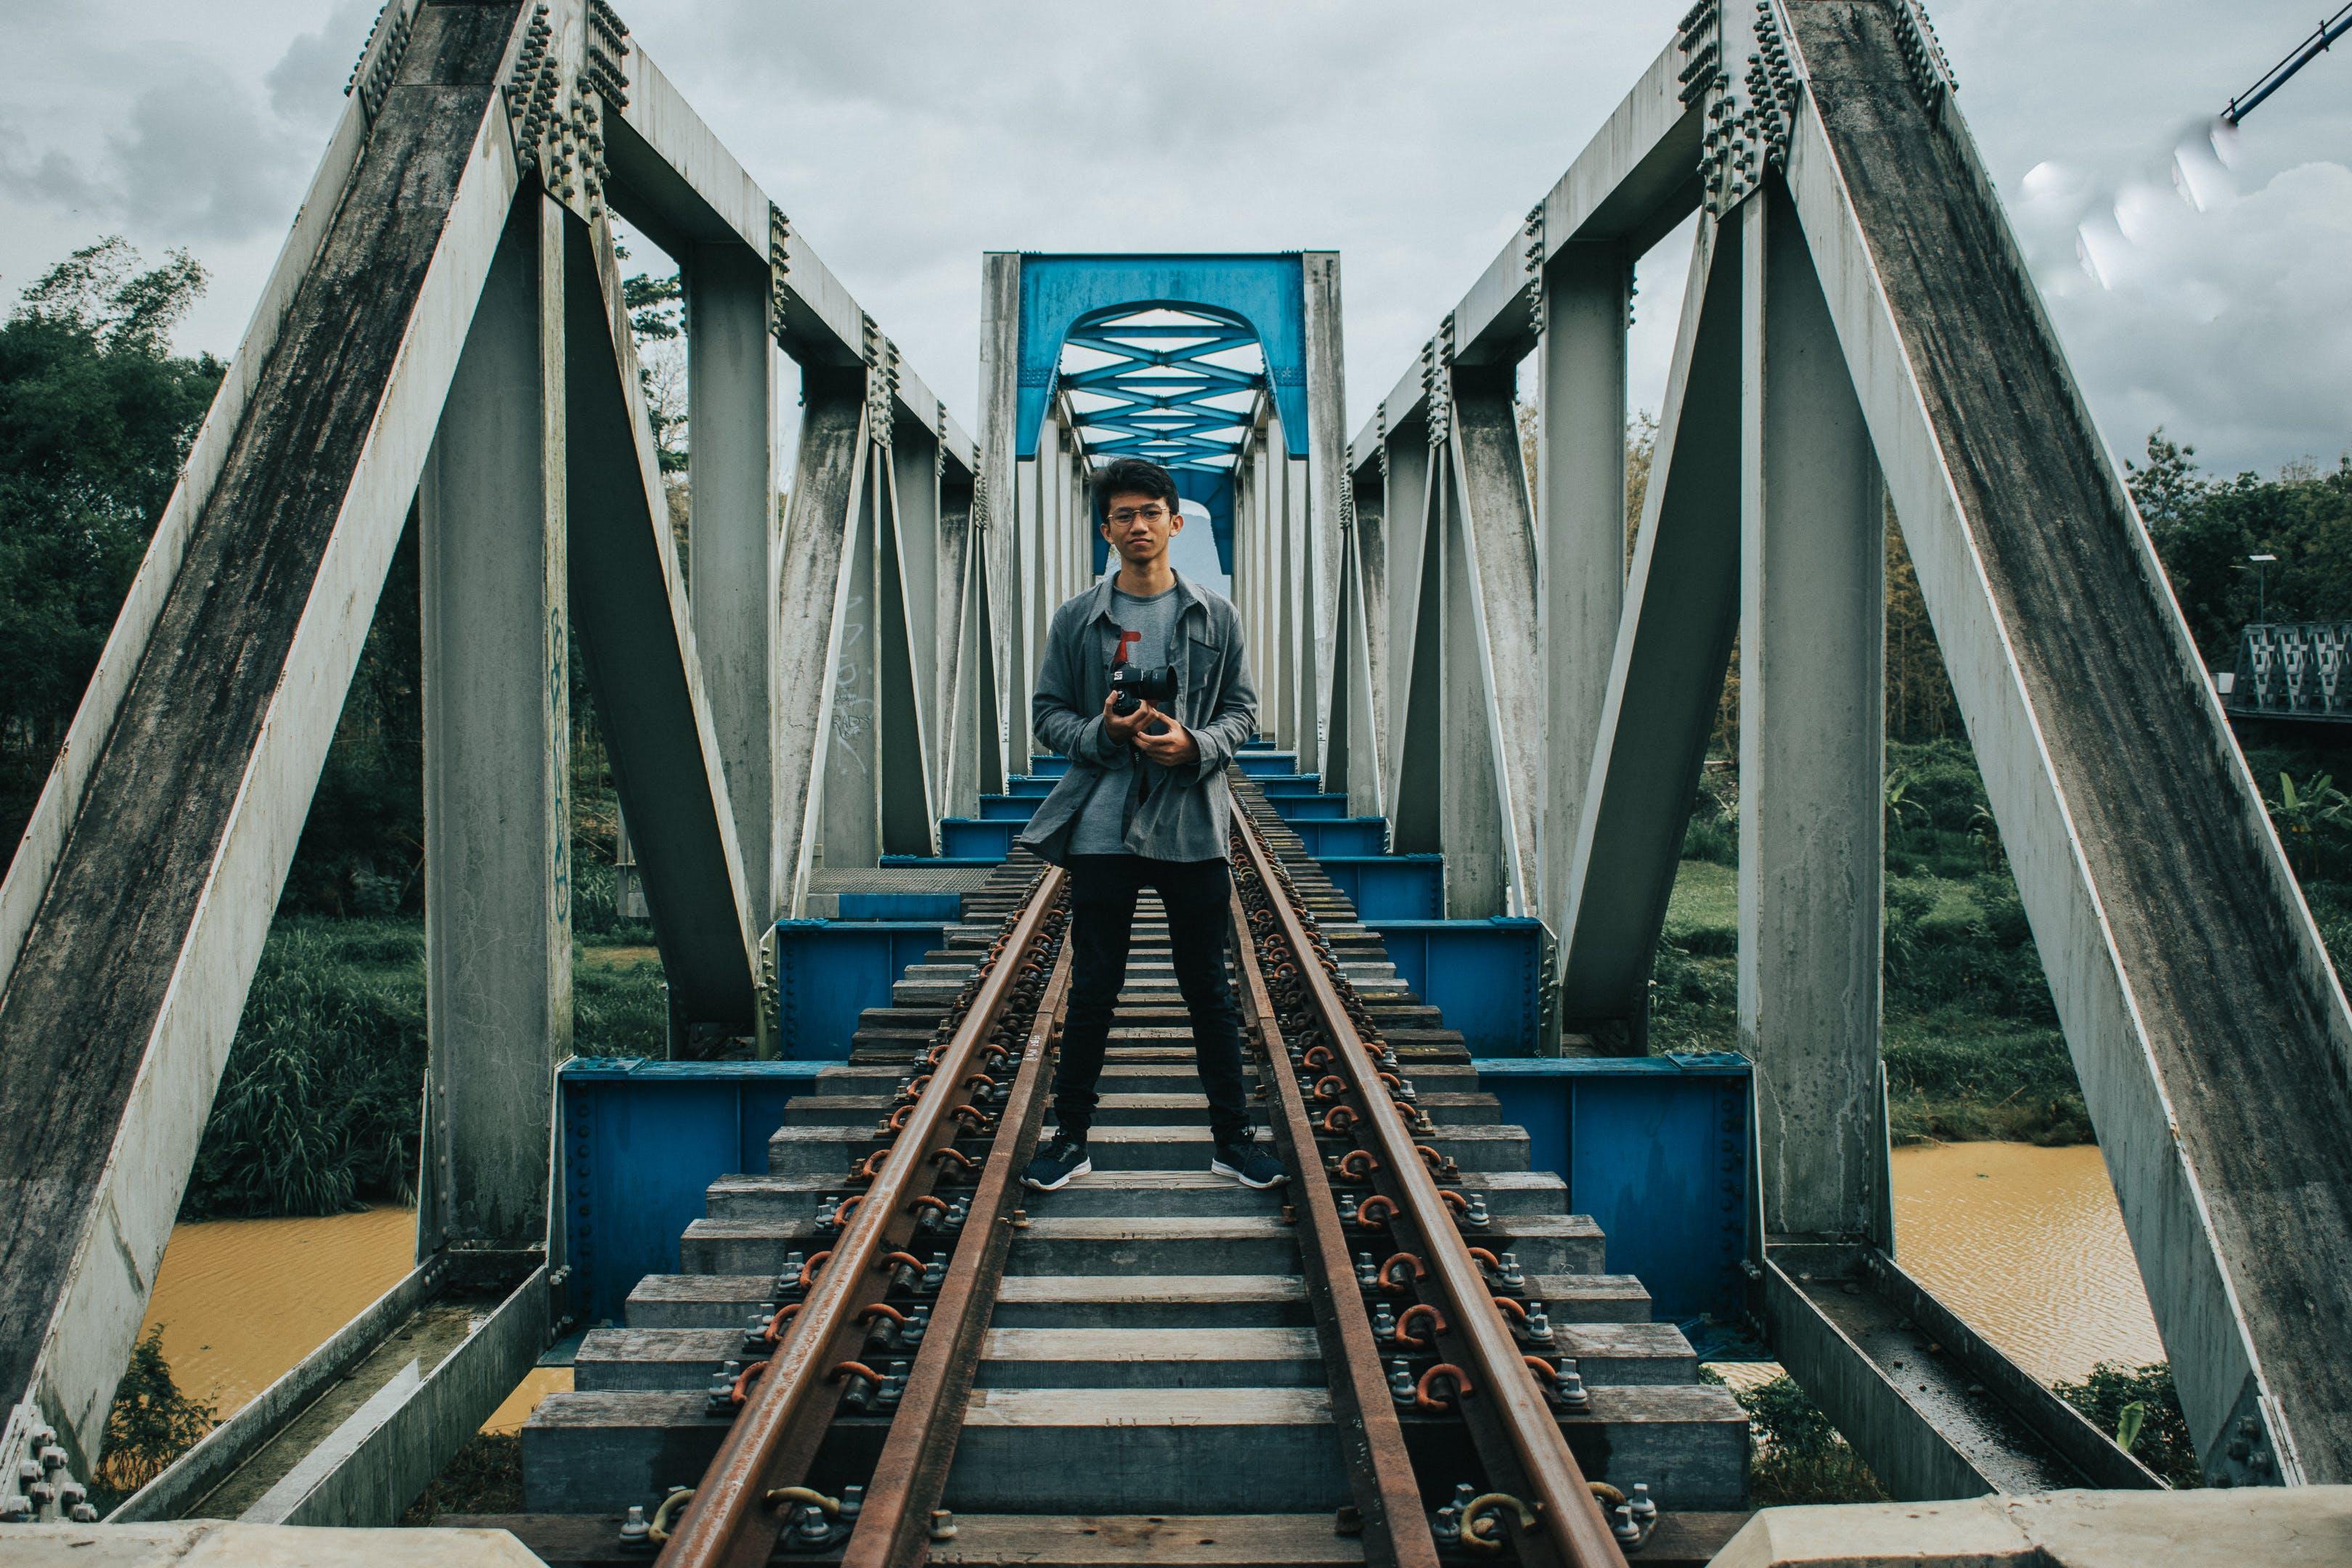 Man Standing on Train Tracks on Bridge Above Body of Water